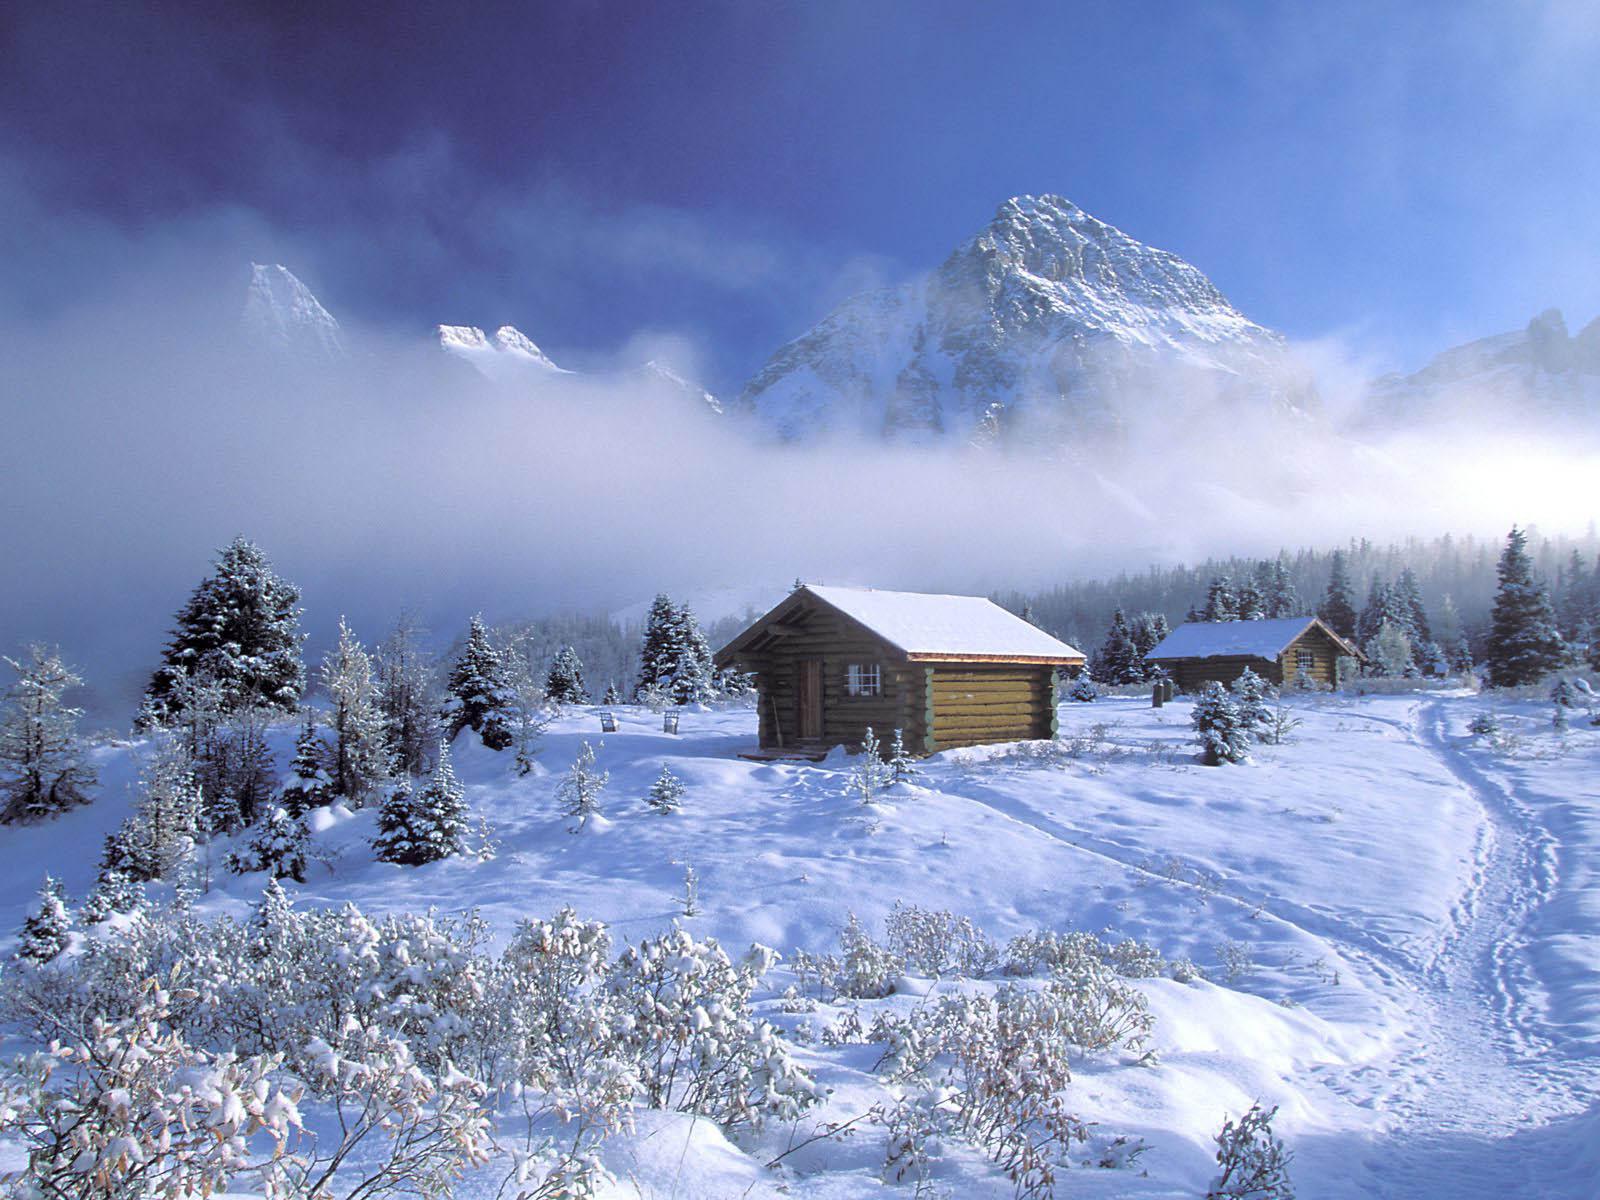 Snow Desktop Wallpapers and Backgrounds   Screensaver 1600x1200